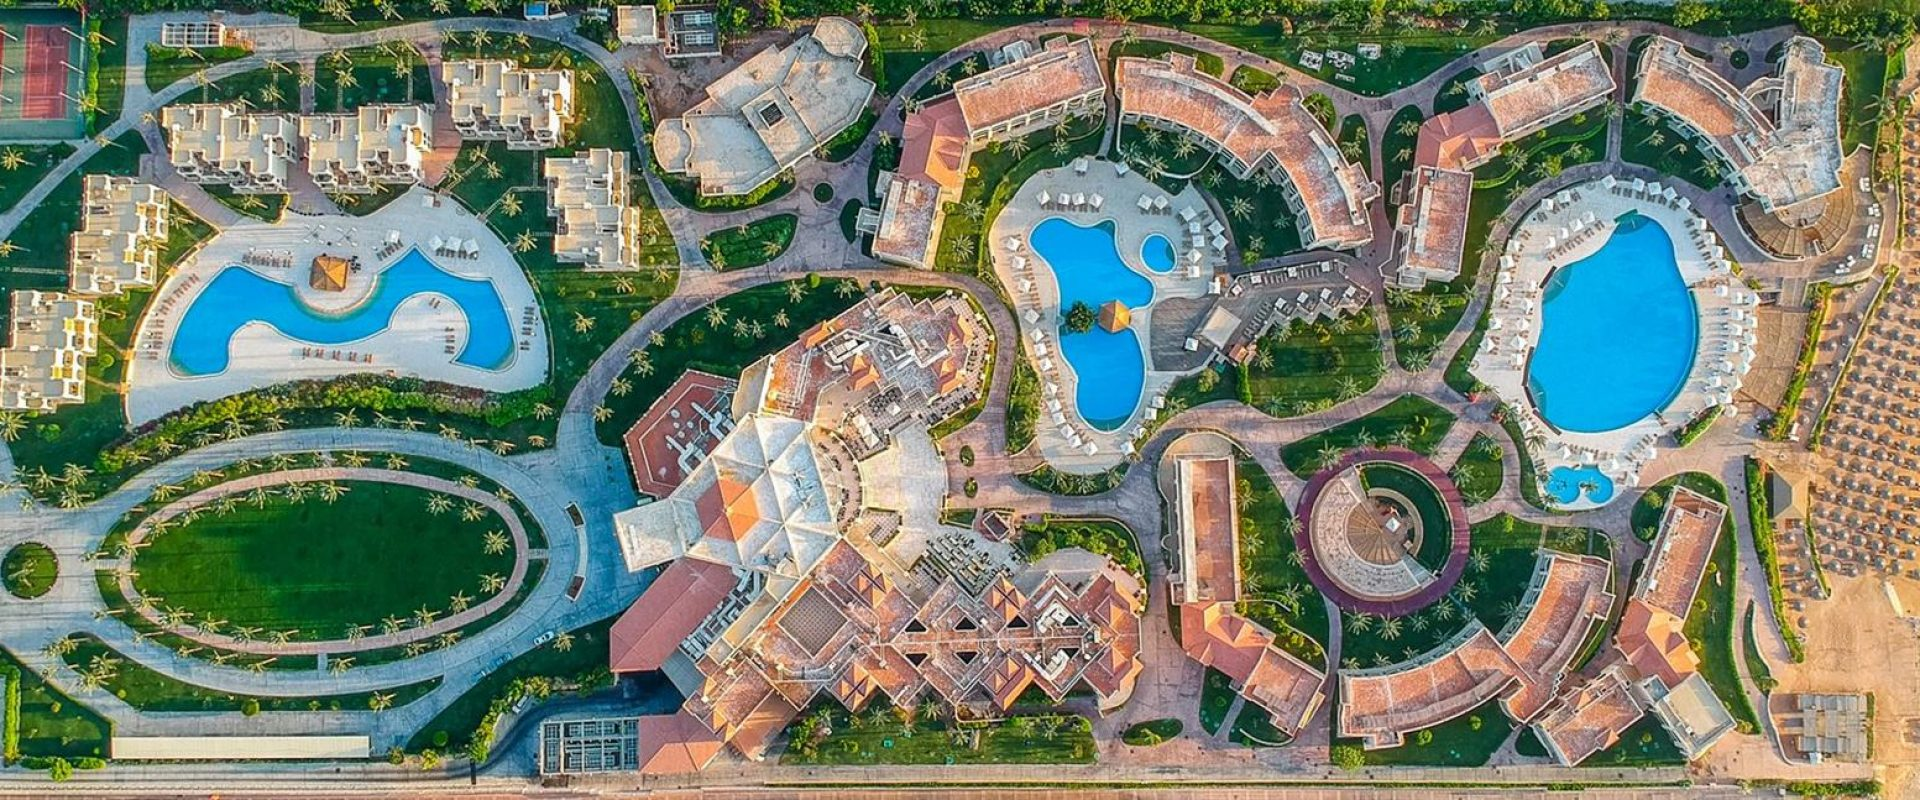 Egipt, Sharm El Sheikh, Hotel Cleopatra Luxury Resort